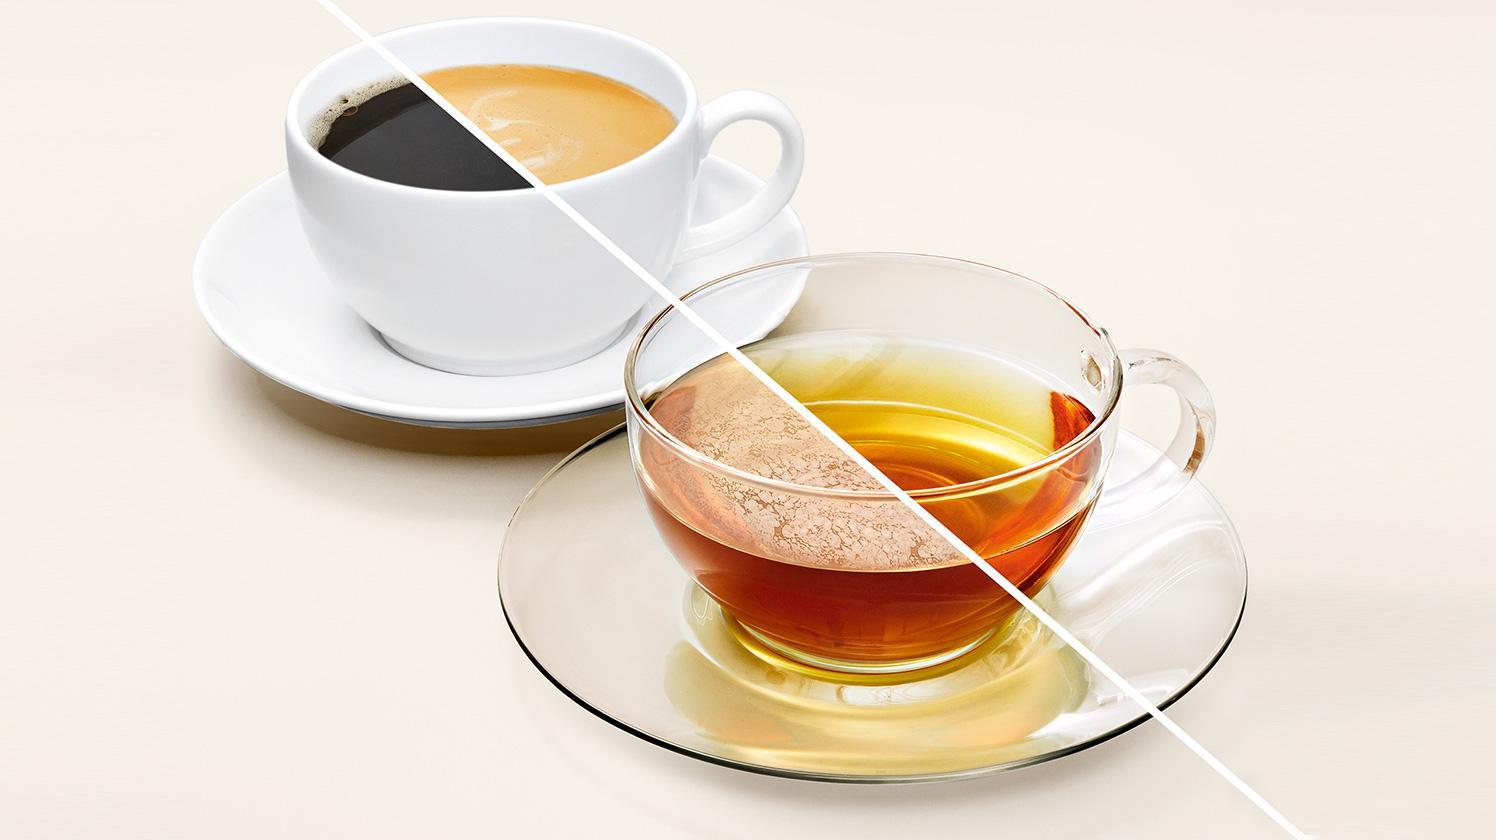 BRITA 濾水器與濾芯 MAXTRA+ 風味 咖啡